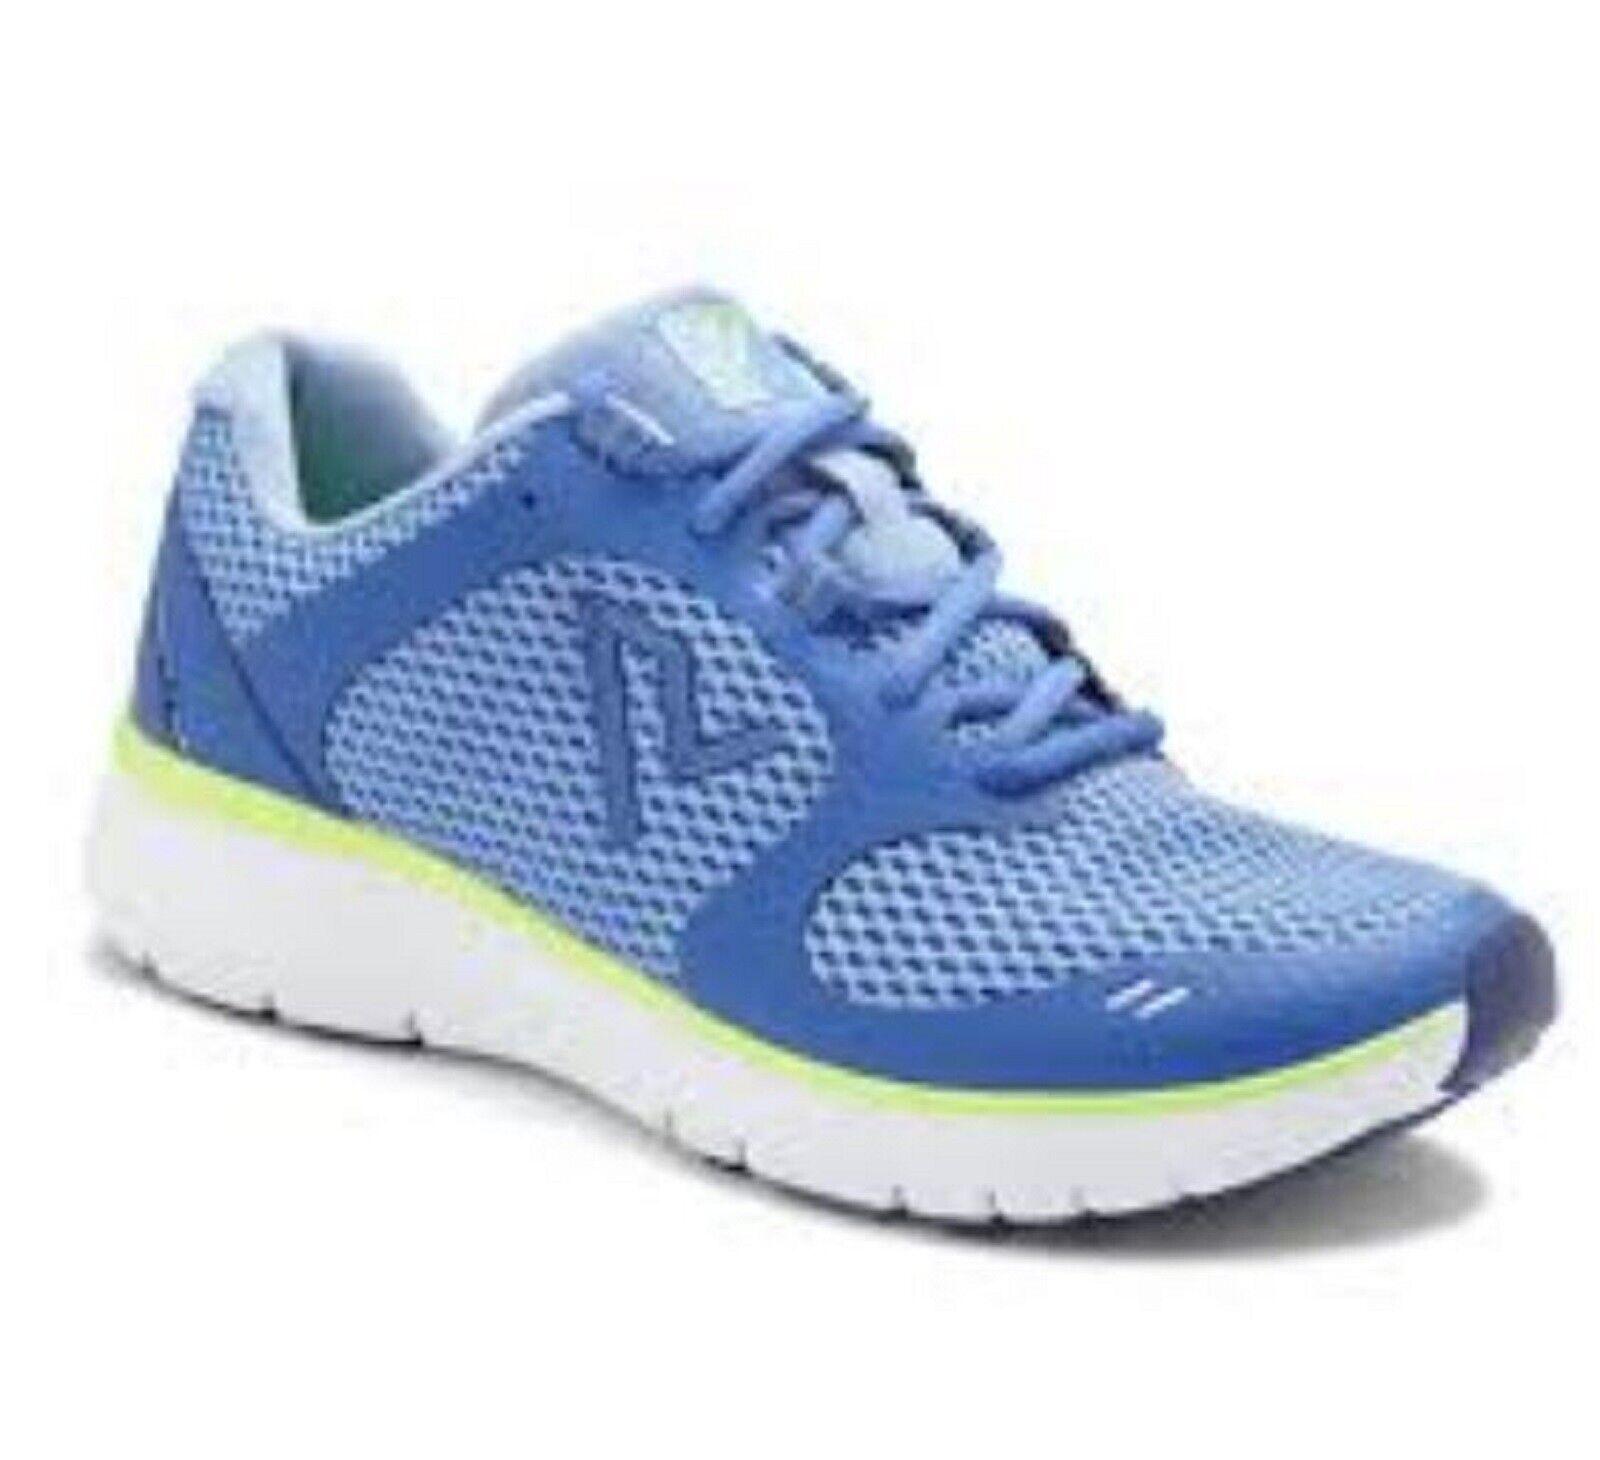 Vionic Orthaheel ELATION 1.0 Actif Baskets Chaussures Bleu Jaune Taille 7 M neuf dans boîte